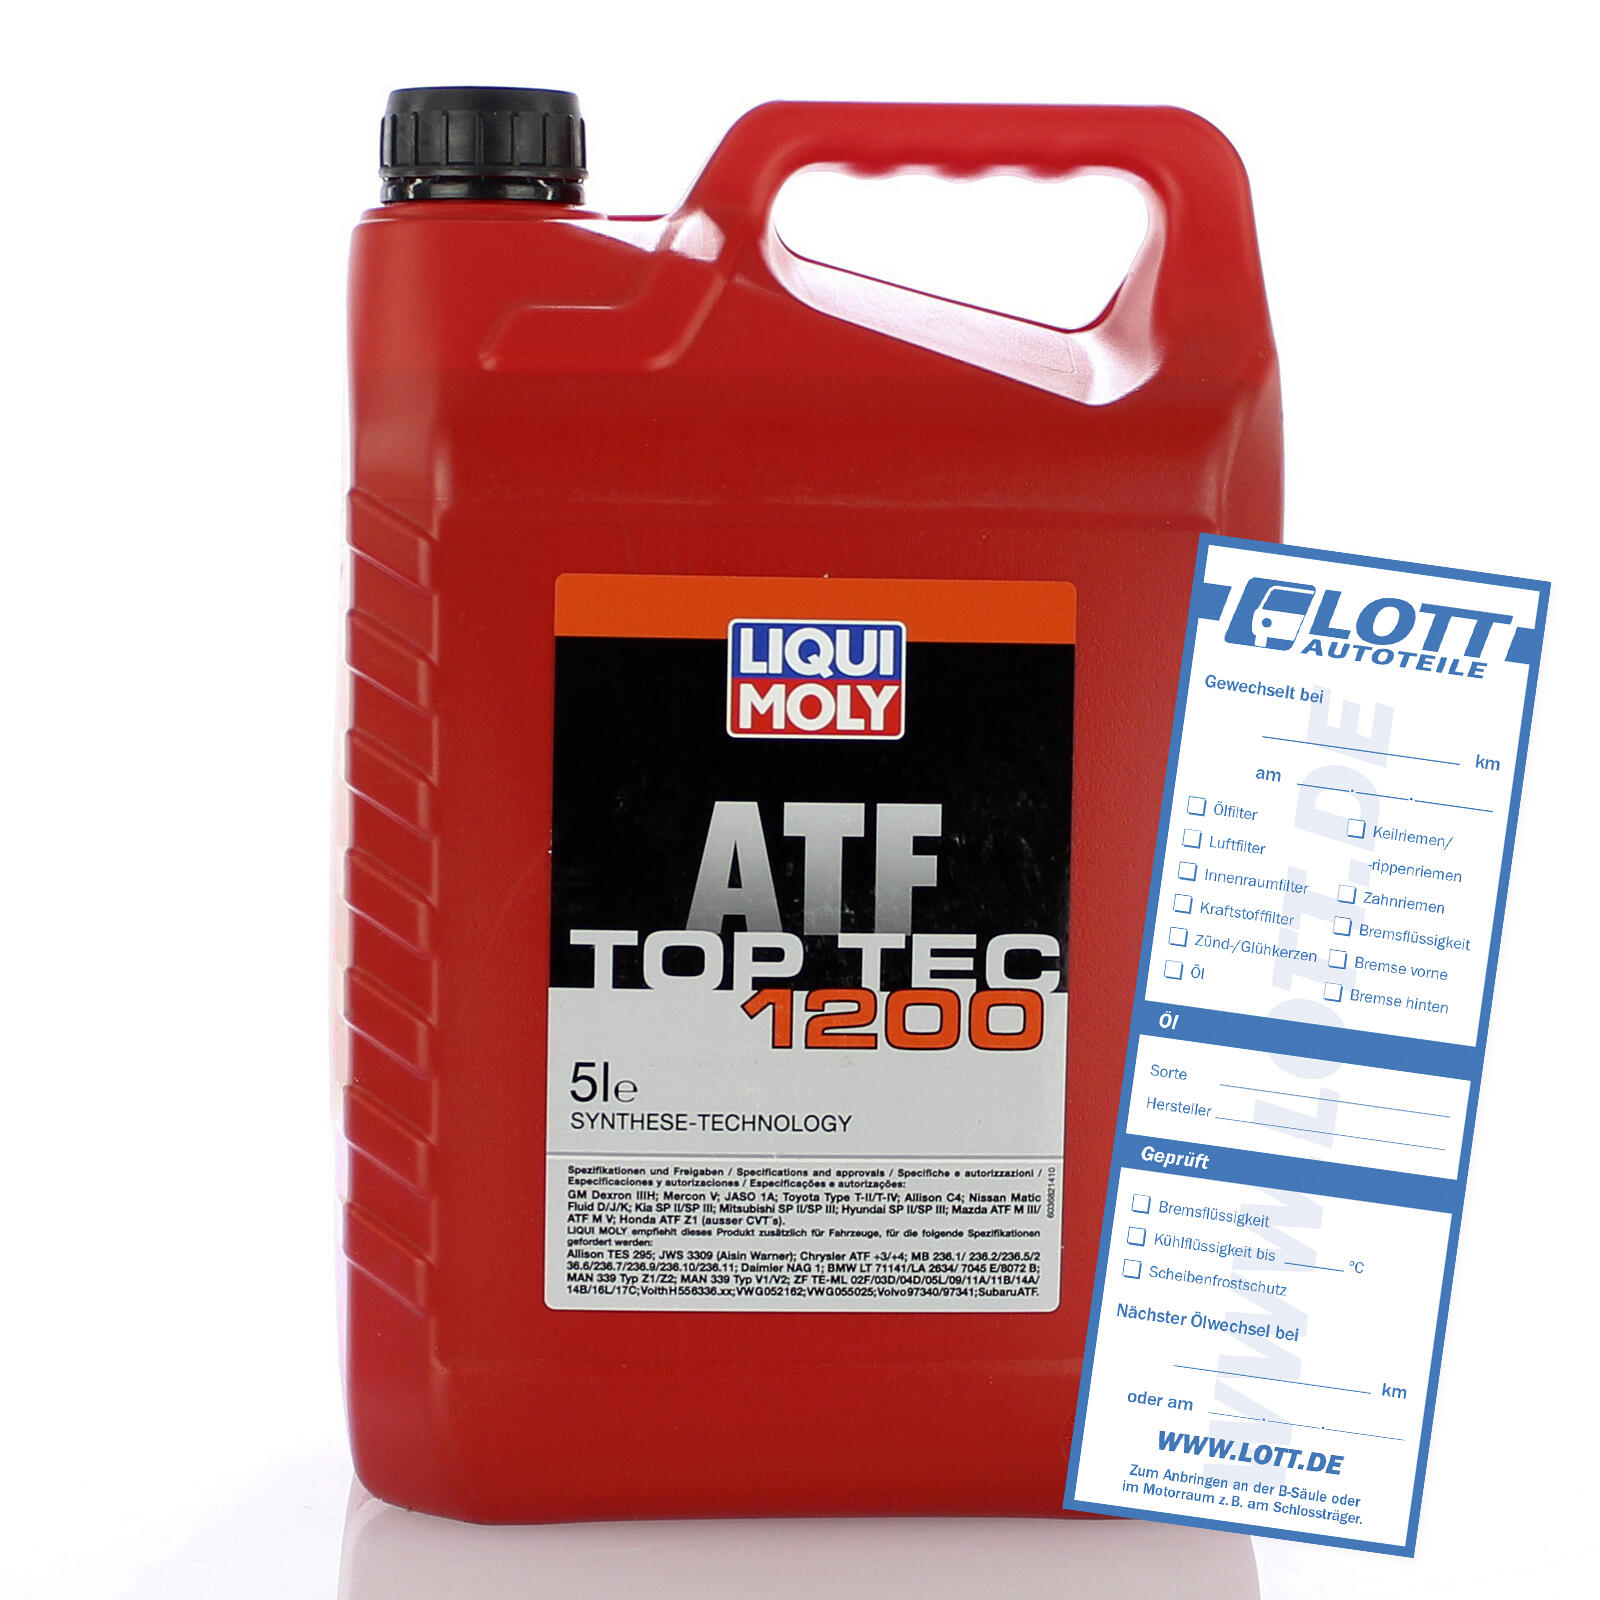 Liqui Moly Automatikgetriebeöl Top Tec ATF 1200 5L